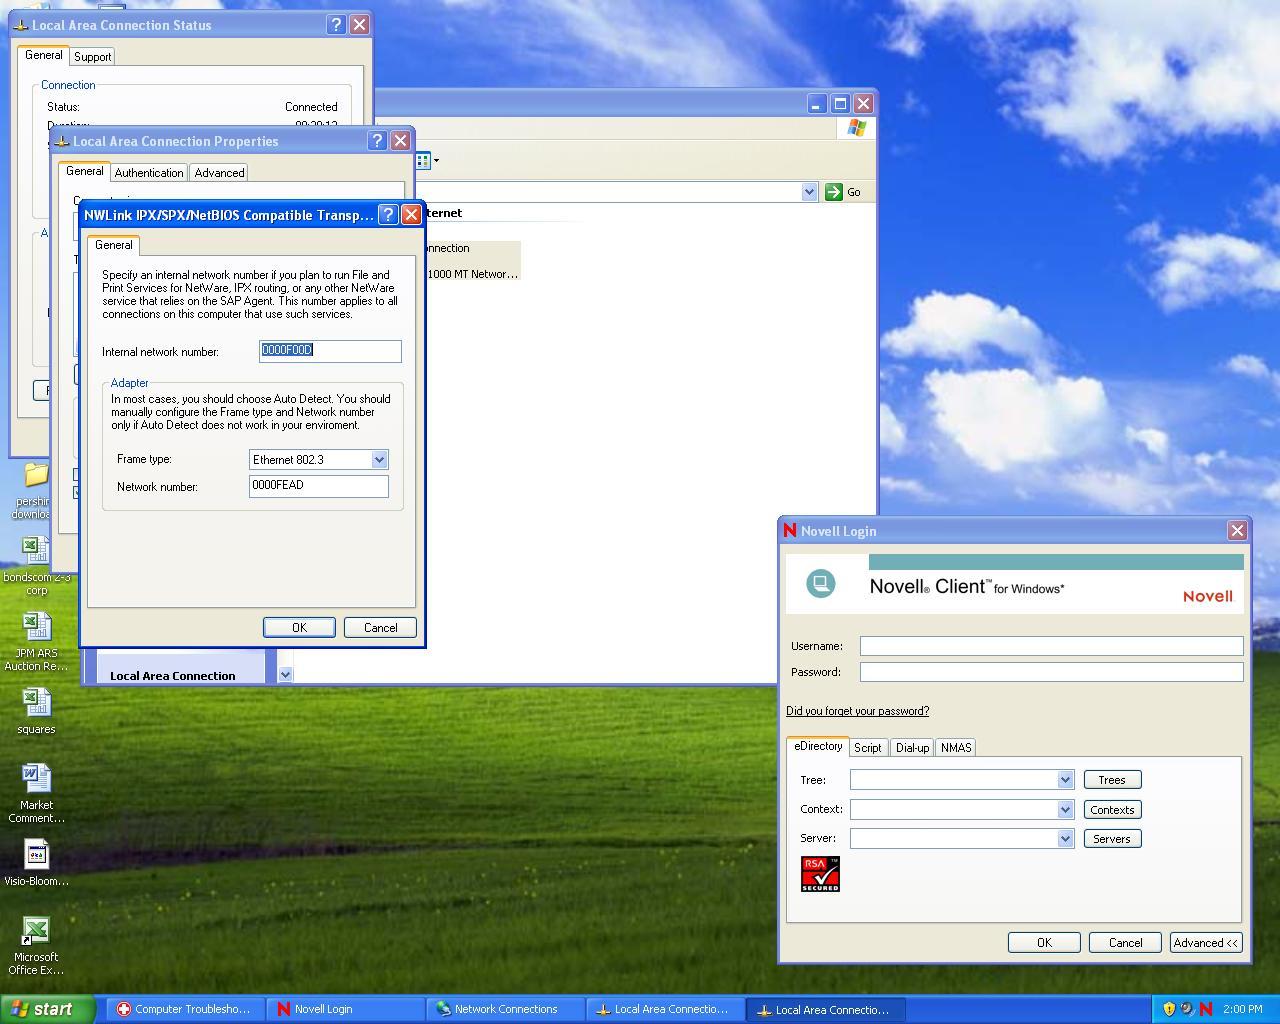 Install Novell Netware 5.1